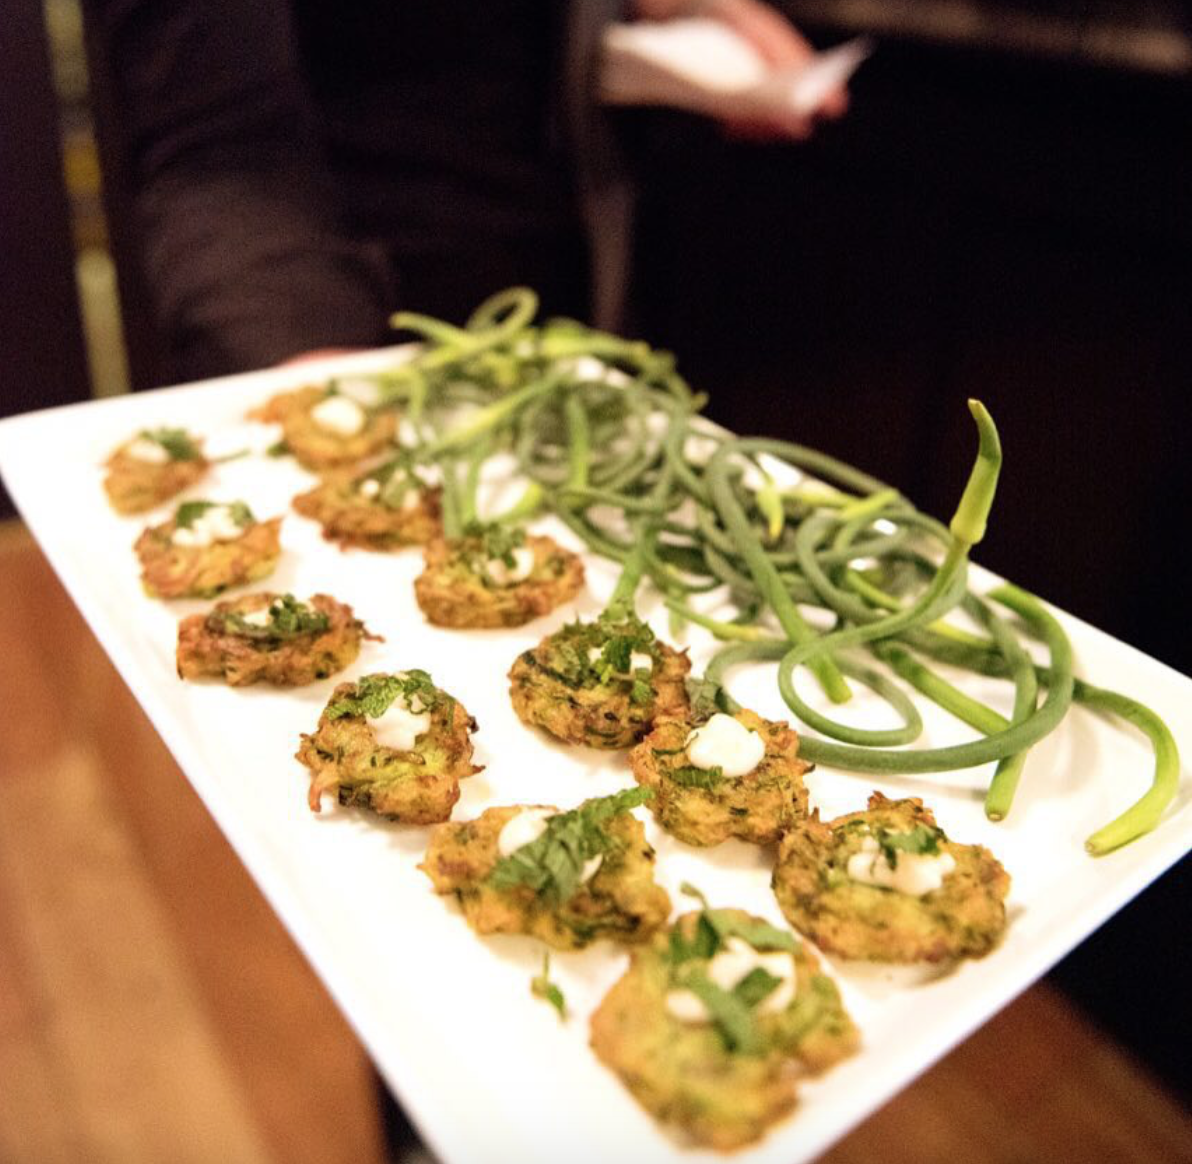 - Zucchini fritters with green garlic aioli